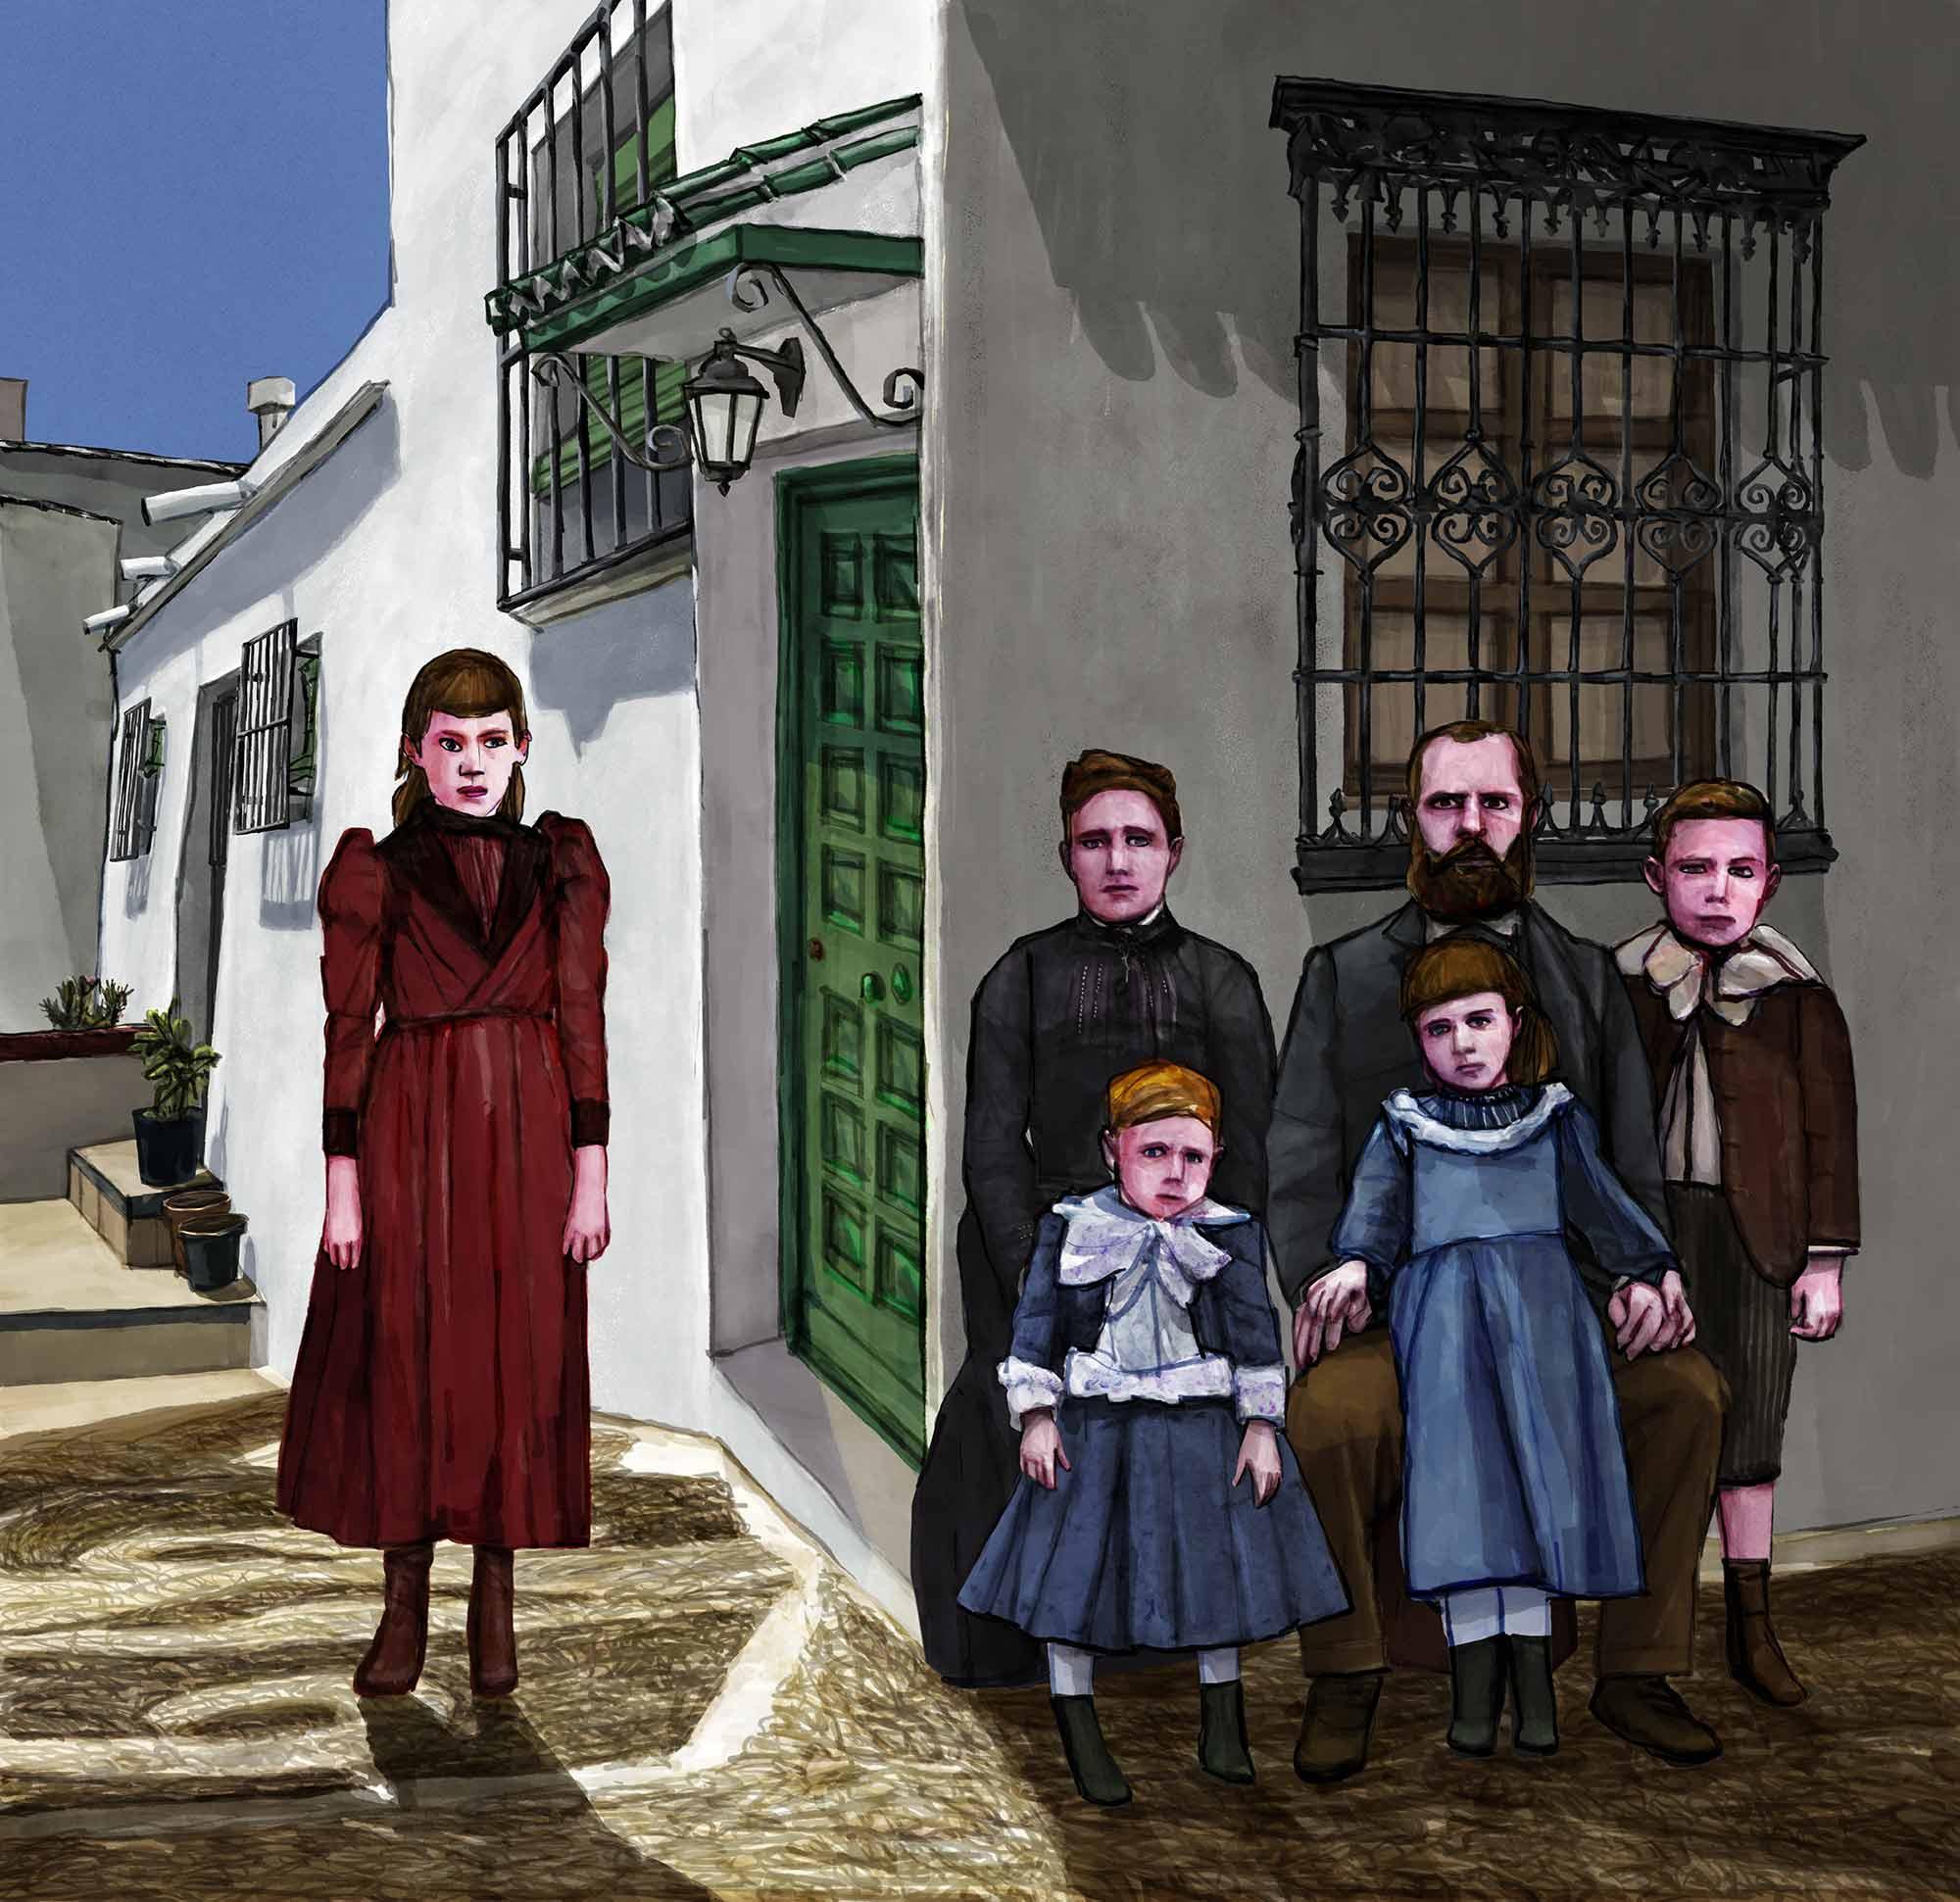 Mario Jodra illustration - Frigiliana La Axarquía